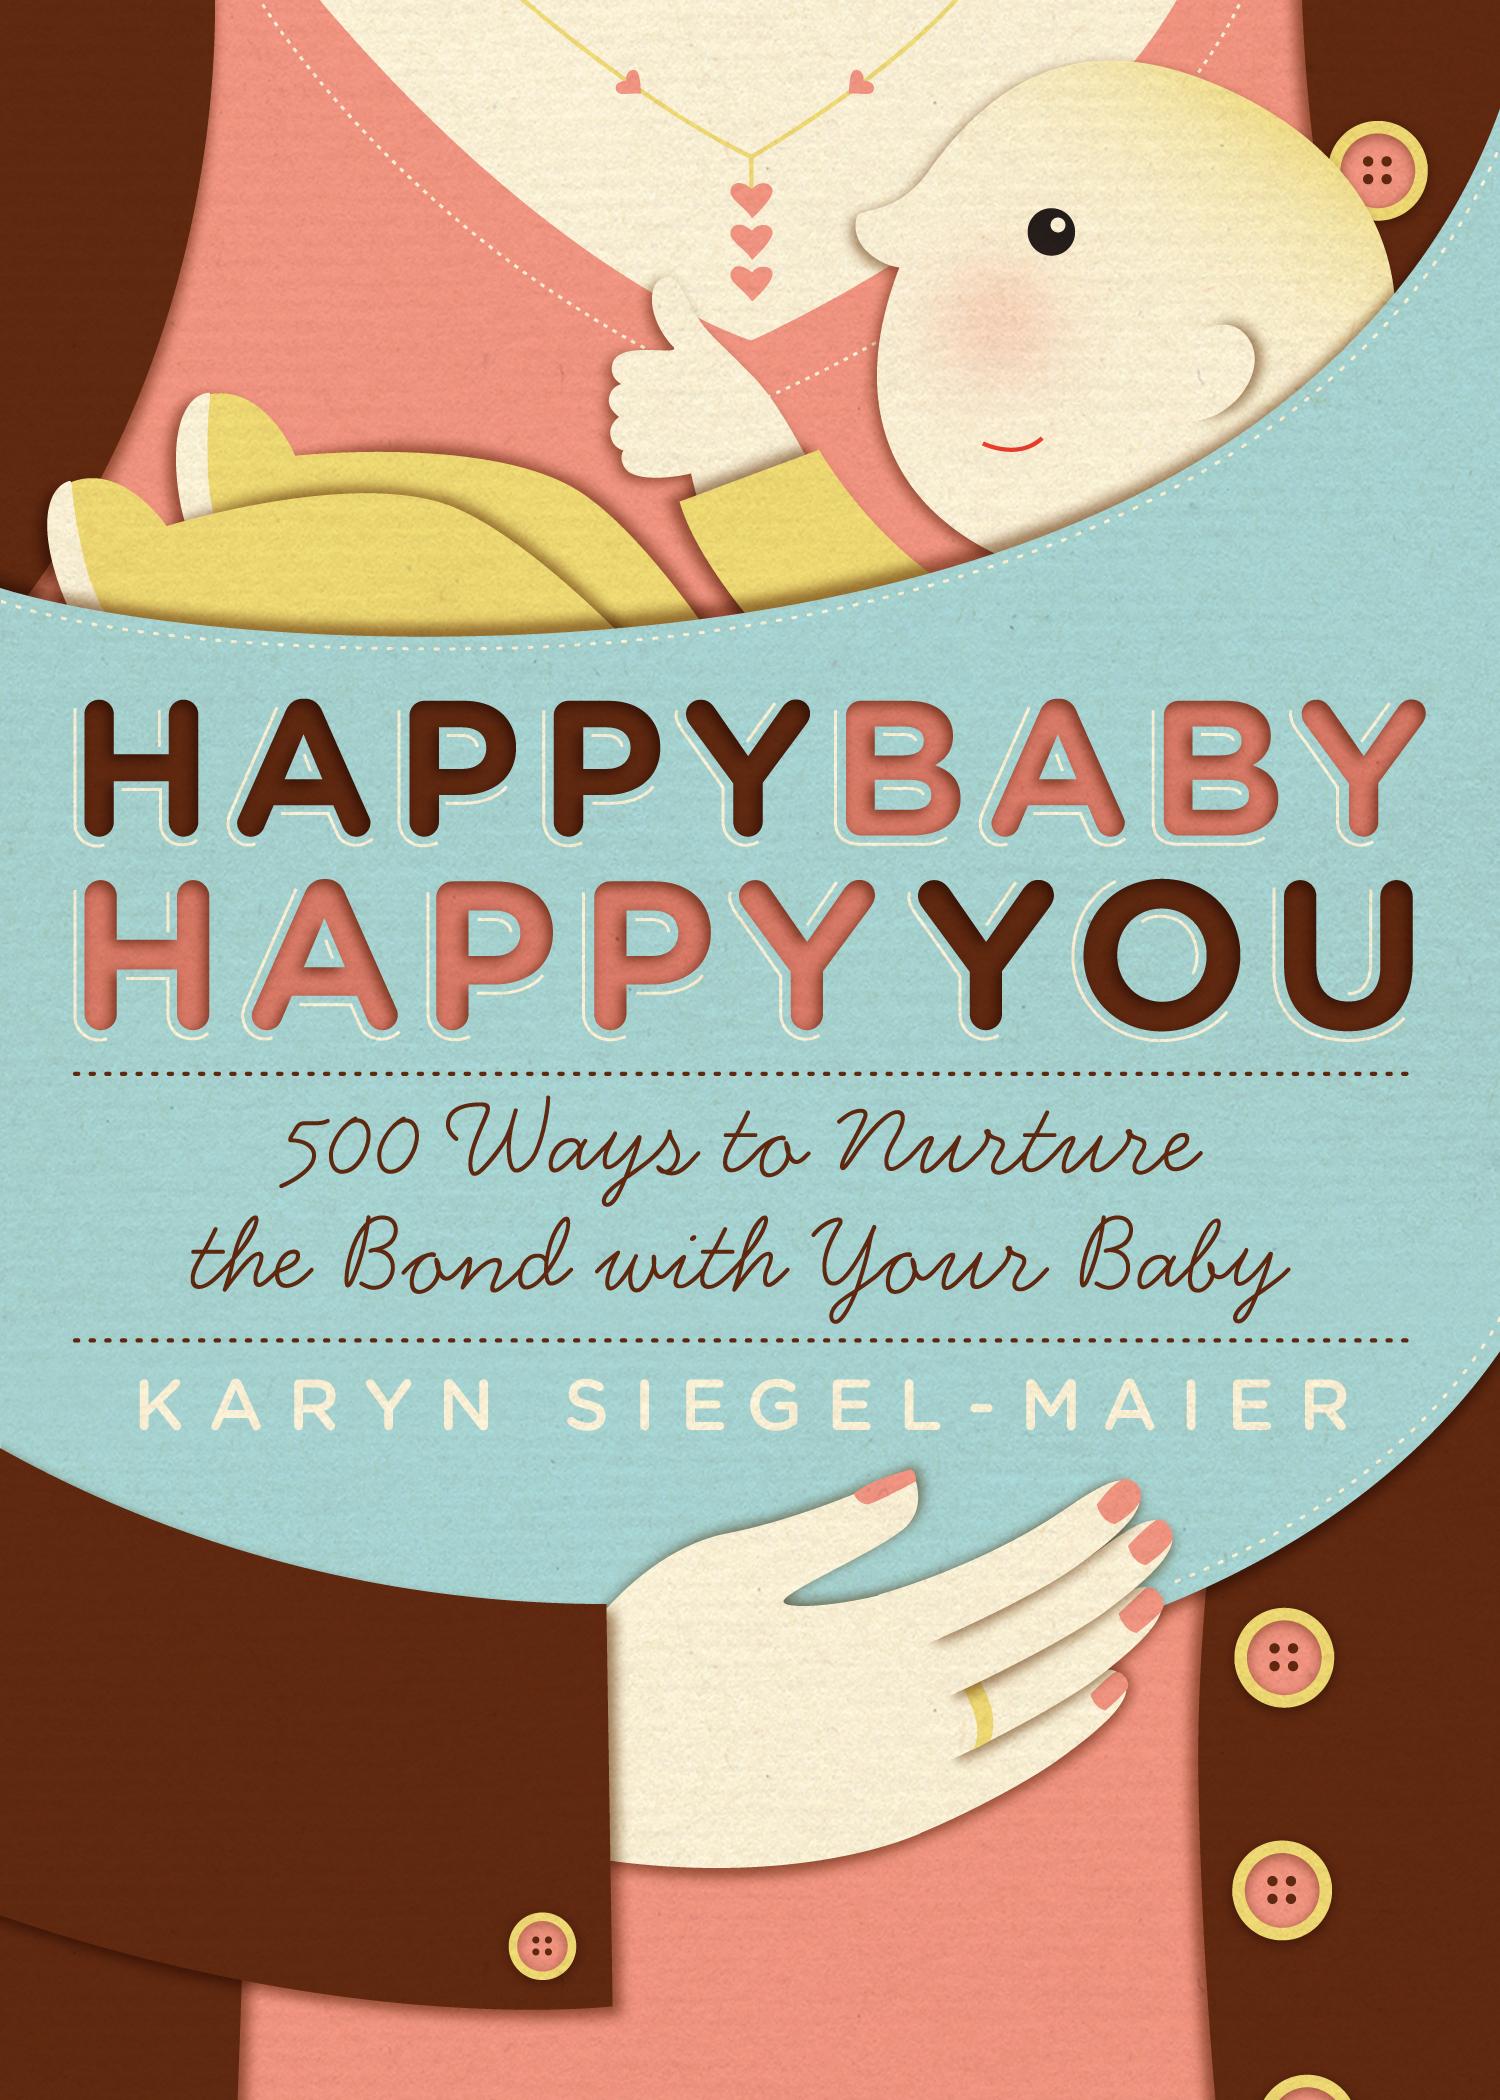 Happy Baby, Happy You 500 Ways to Nurture the Bond with Your Baby - Karyn Siegel-Maier